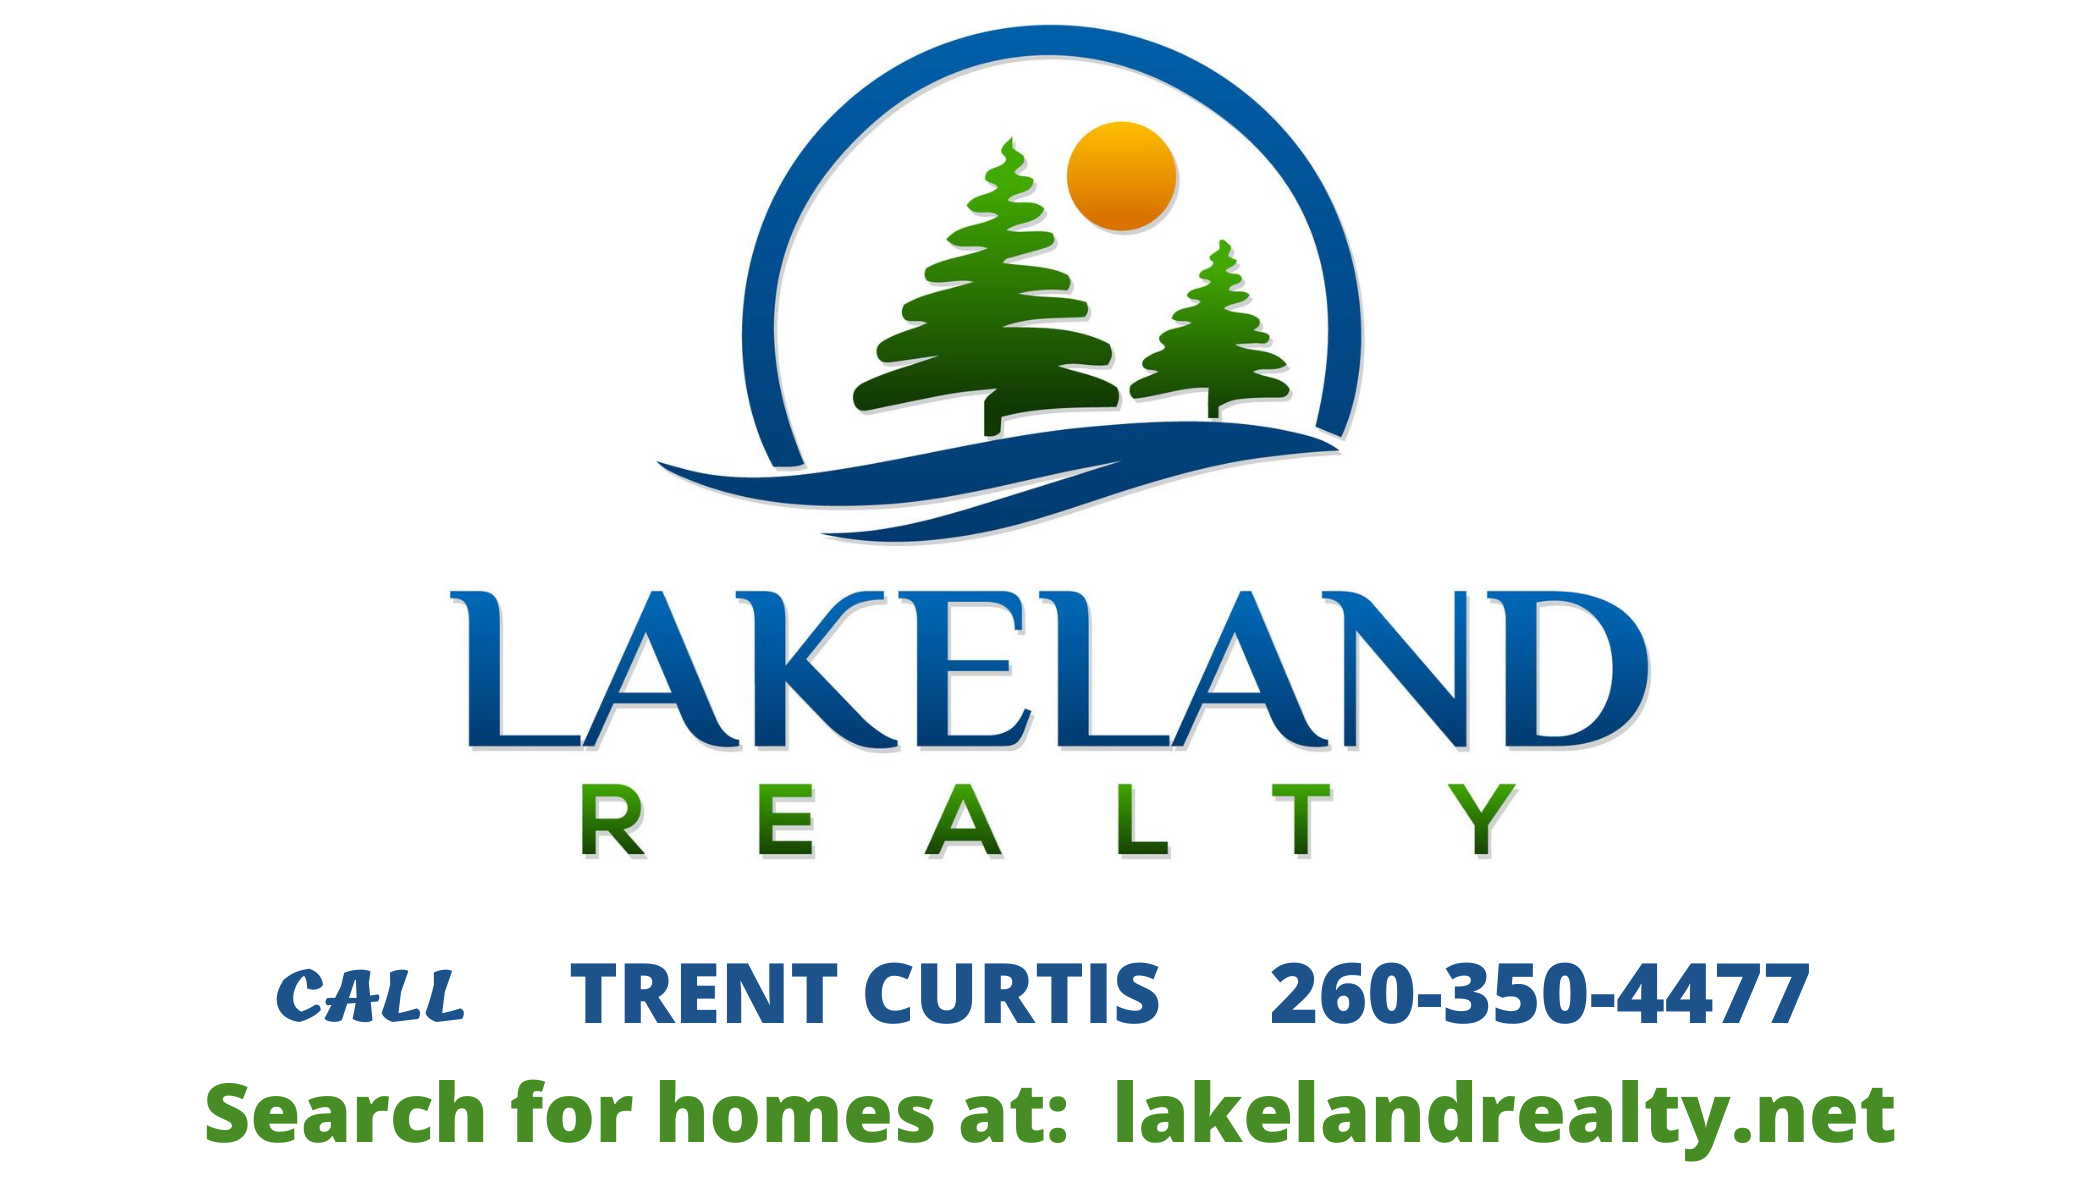 Lakeland Realty